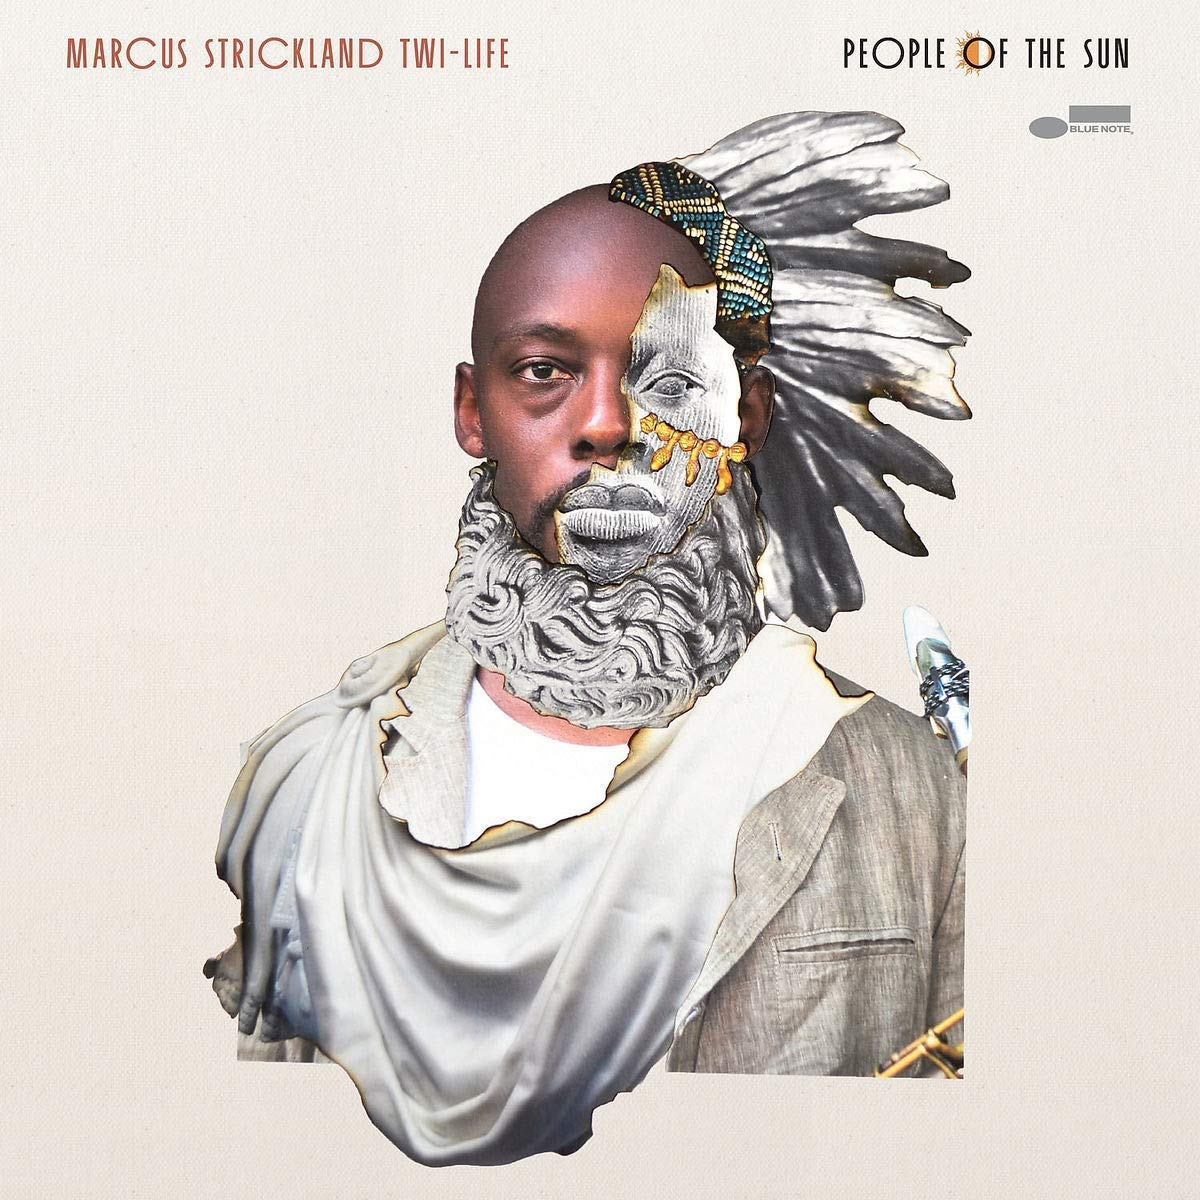 Vinilo : Marcus Strickland - People Of The Sun (LP Vinyl)